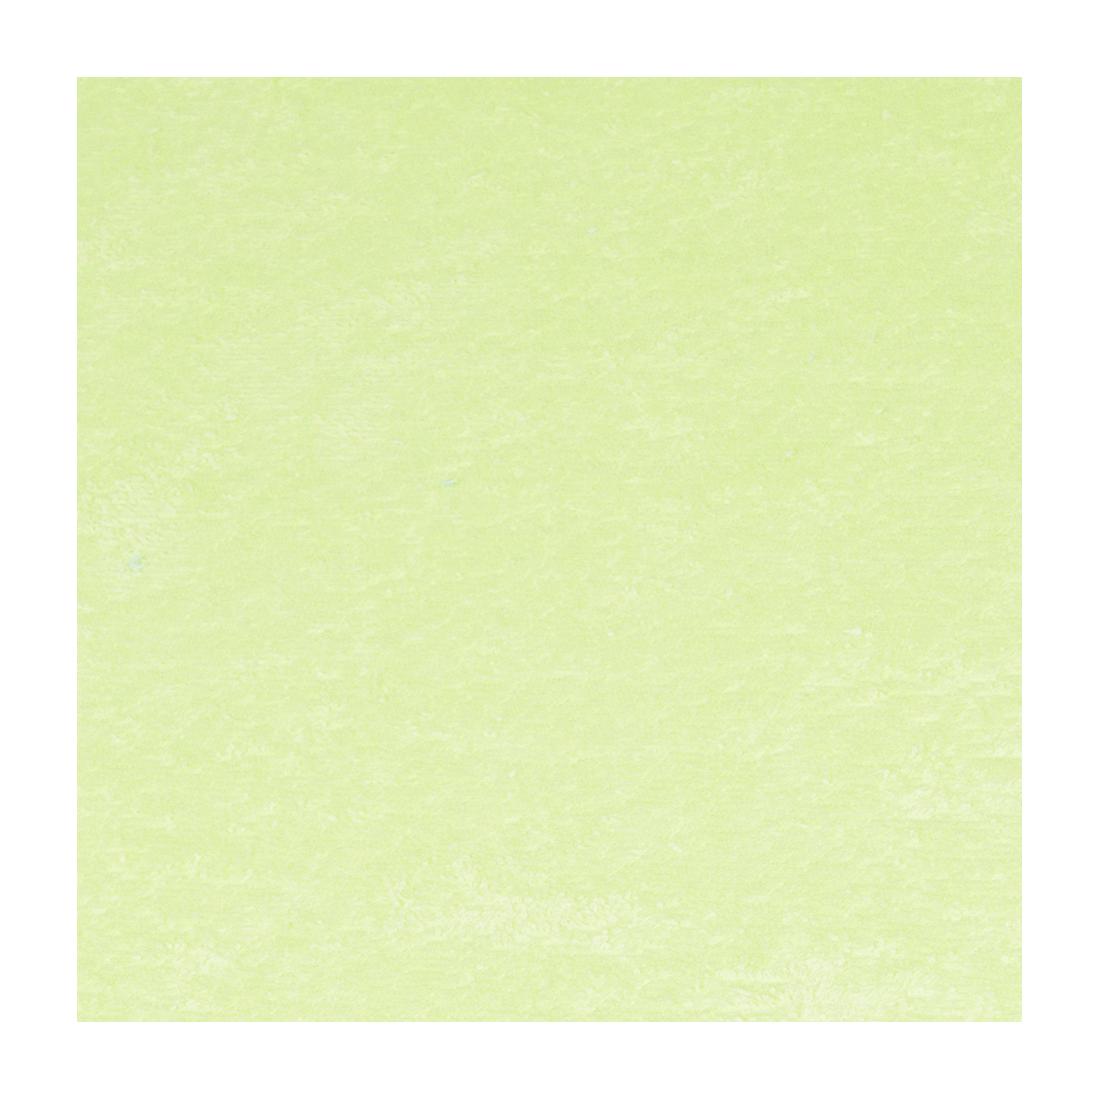 NP froté půlválec 15x50 VISCO z, zelená